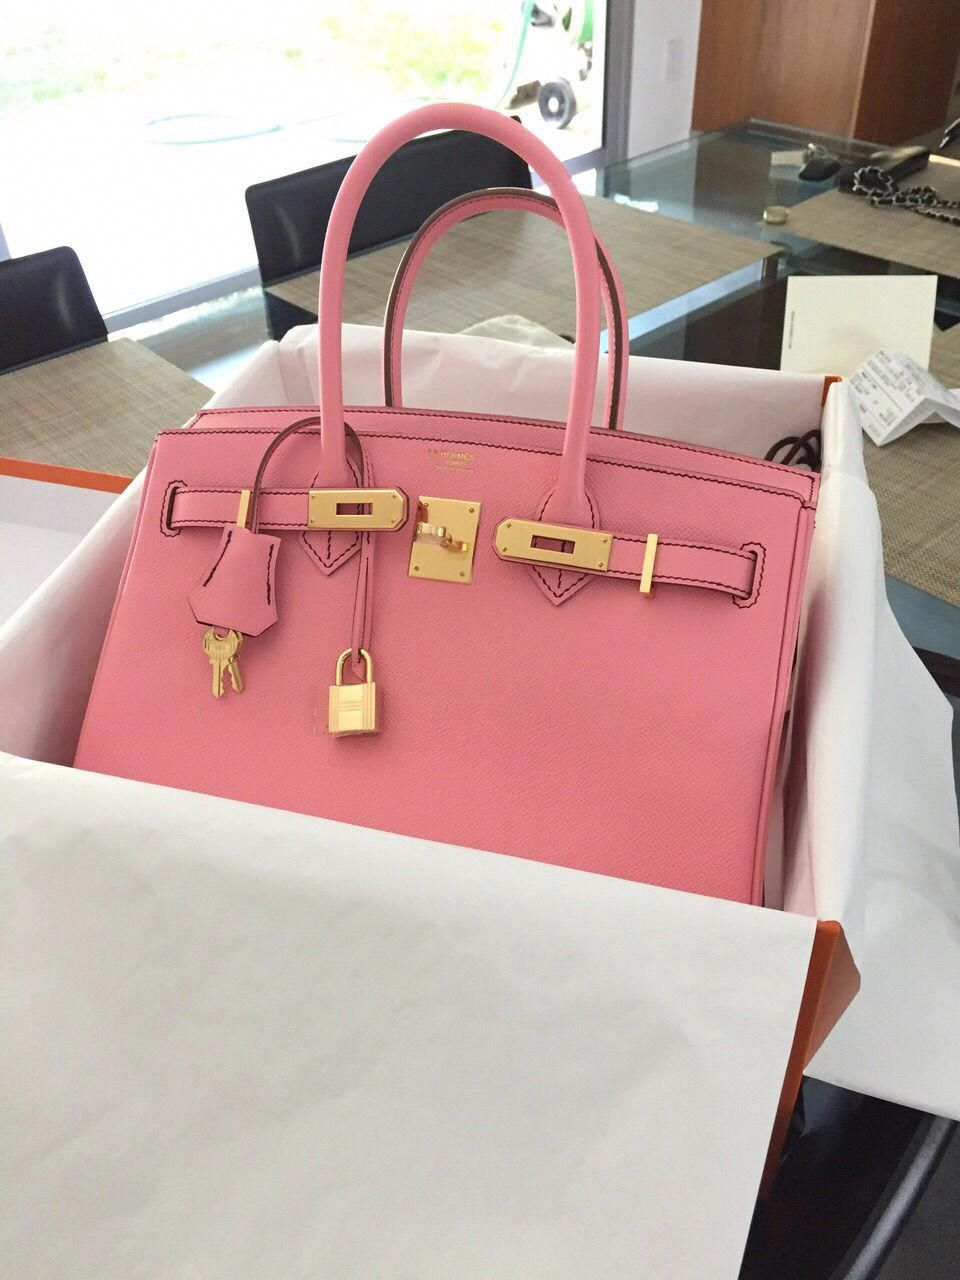 8543064381b Yummy Special Order Hermes Birkin 30 Rose Confetti Pink Bag   Designerhandbags